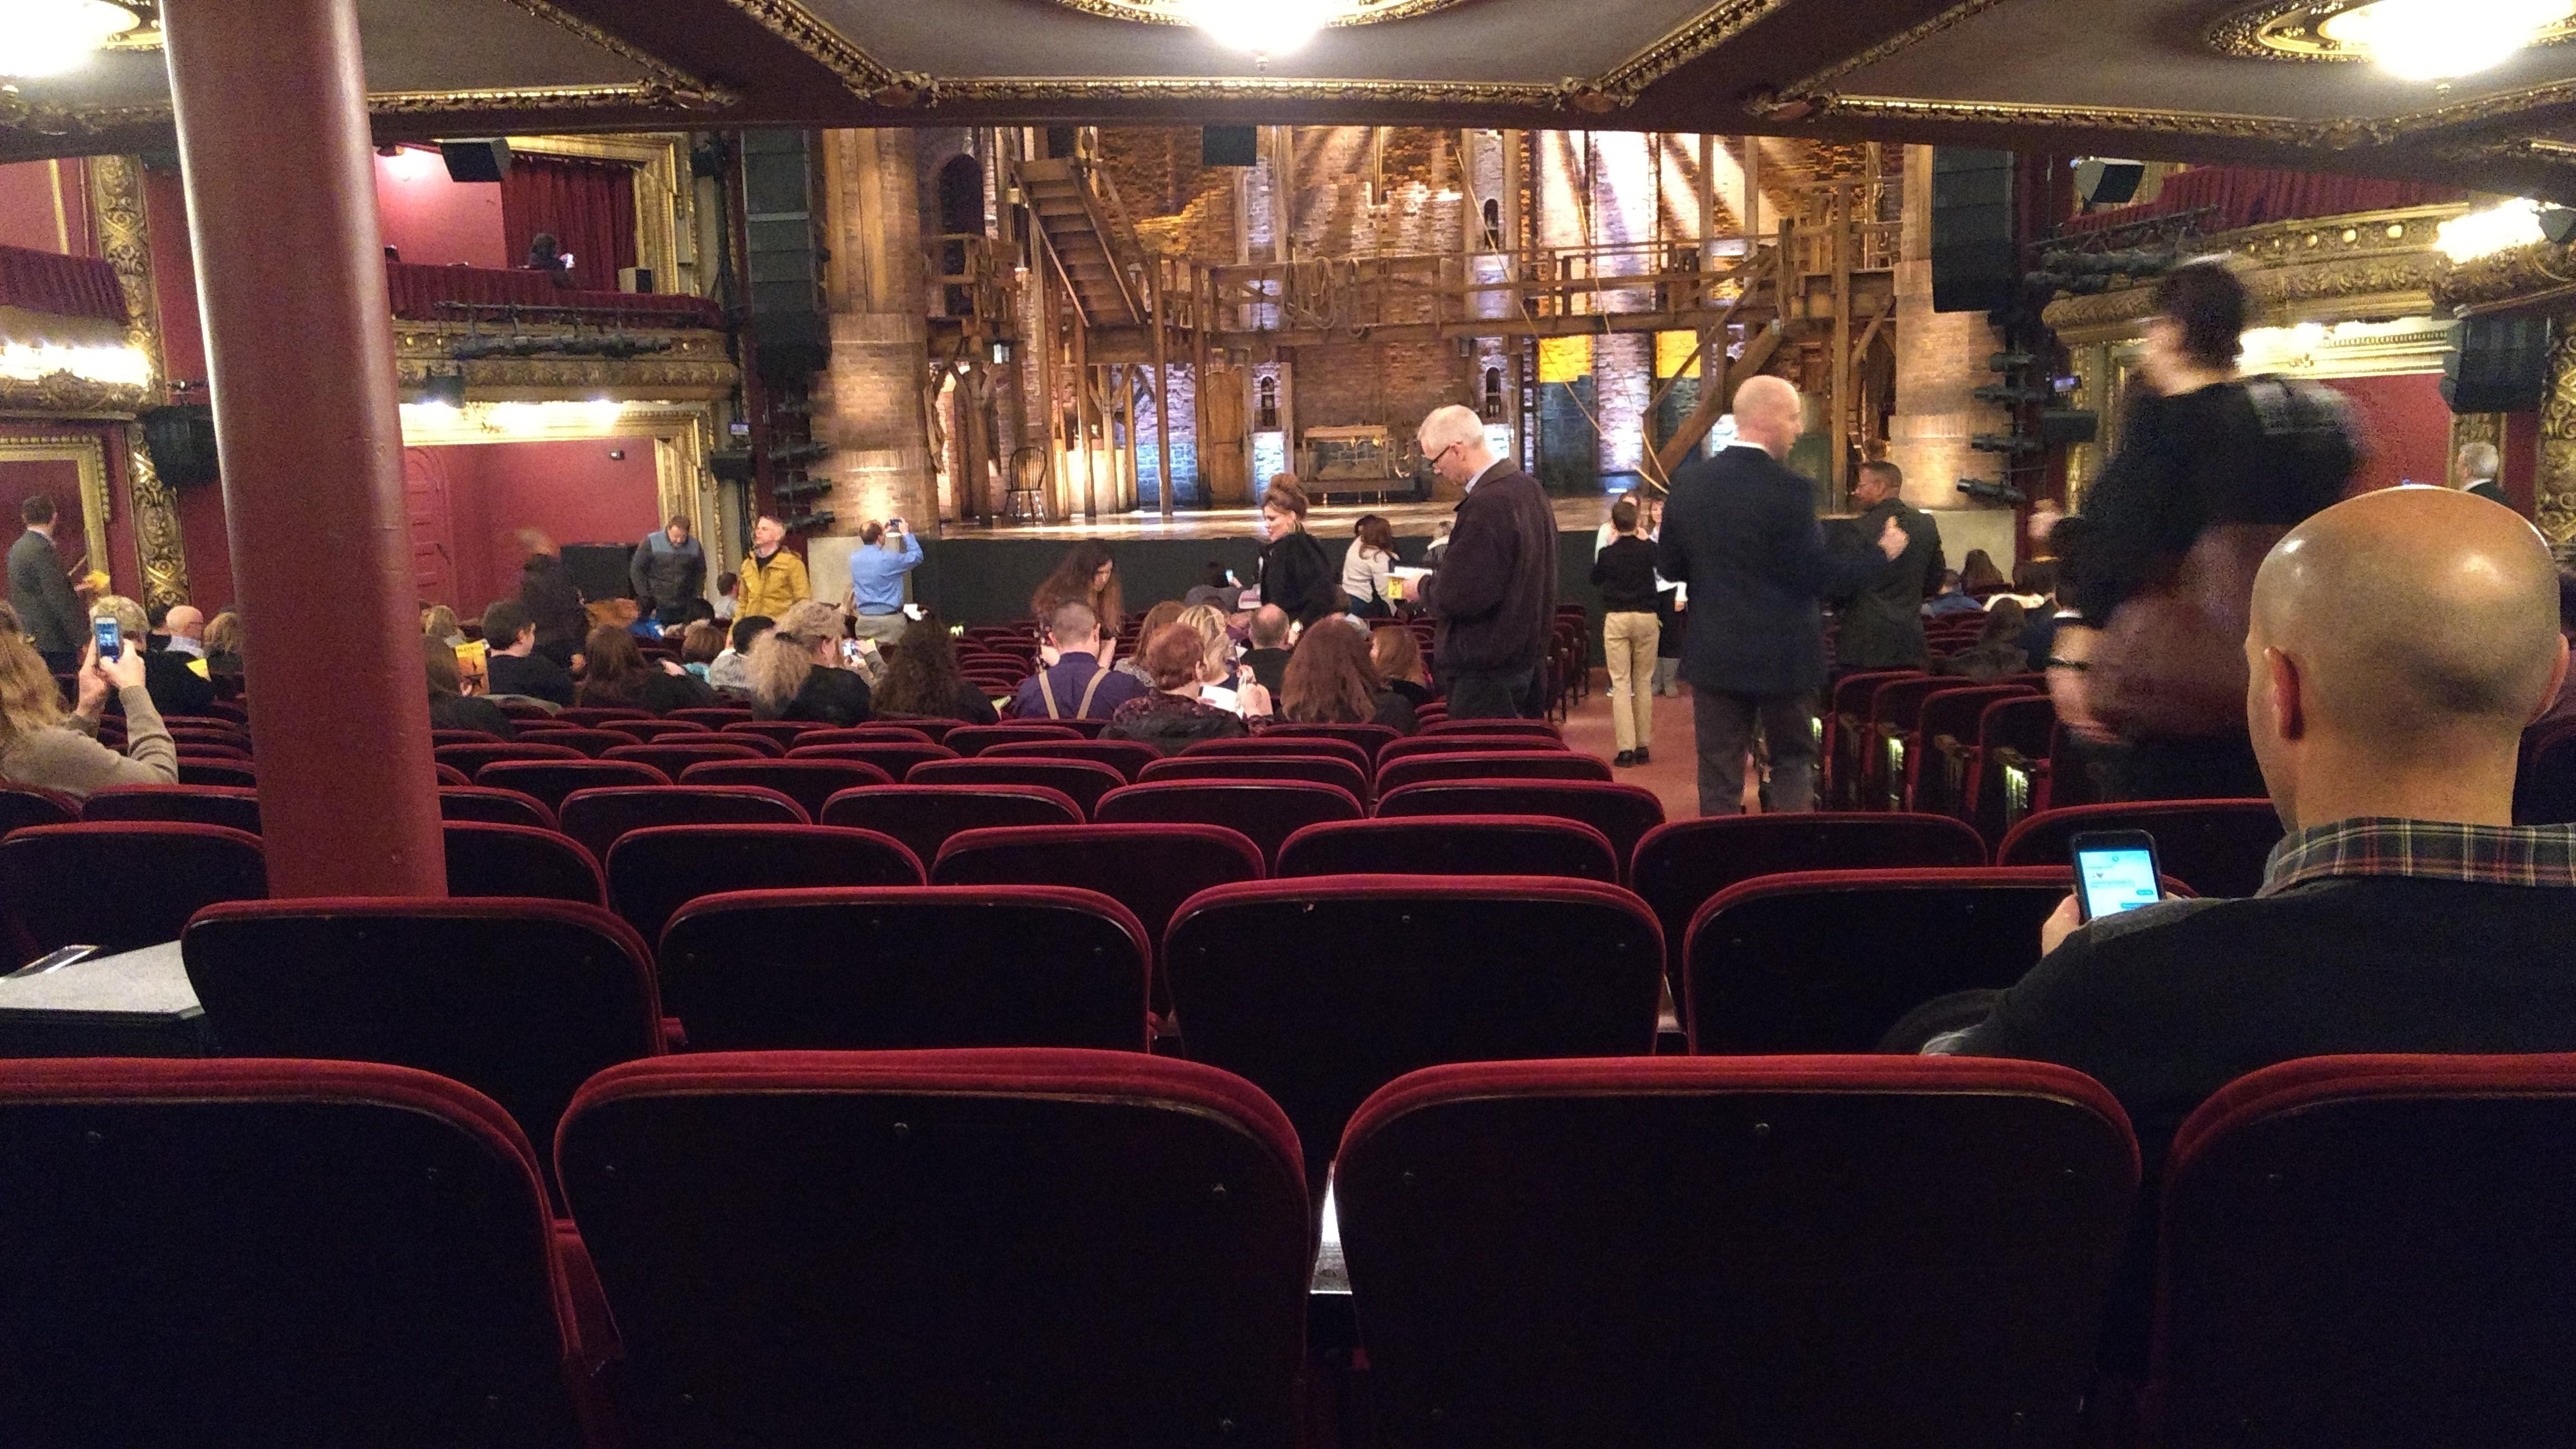 CIBC Theatre Section Orchestra R Row Z Seat 118